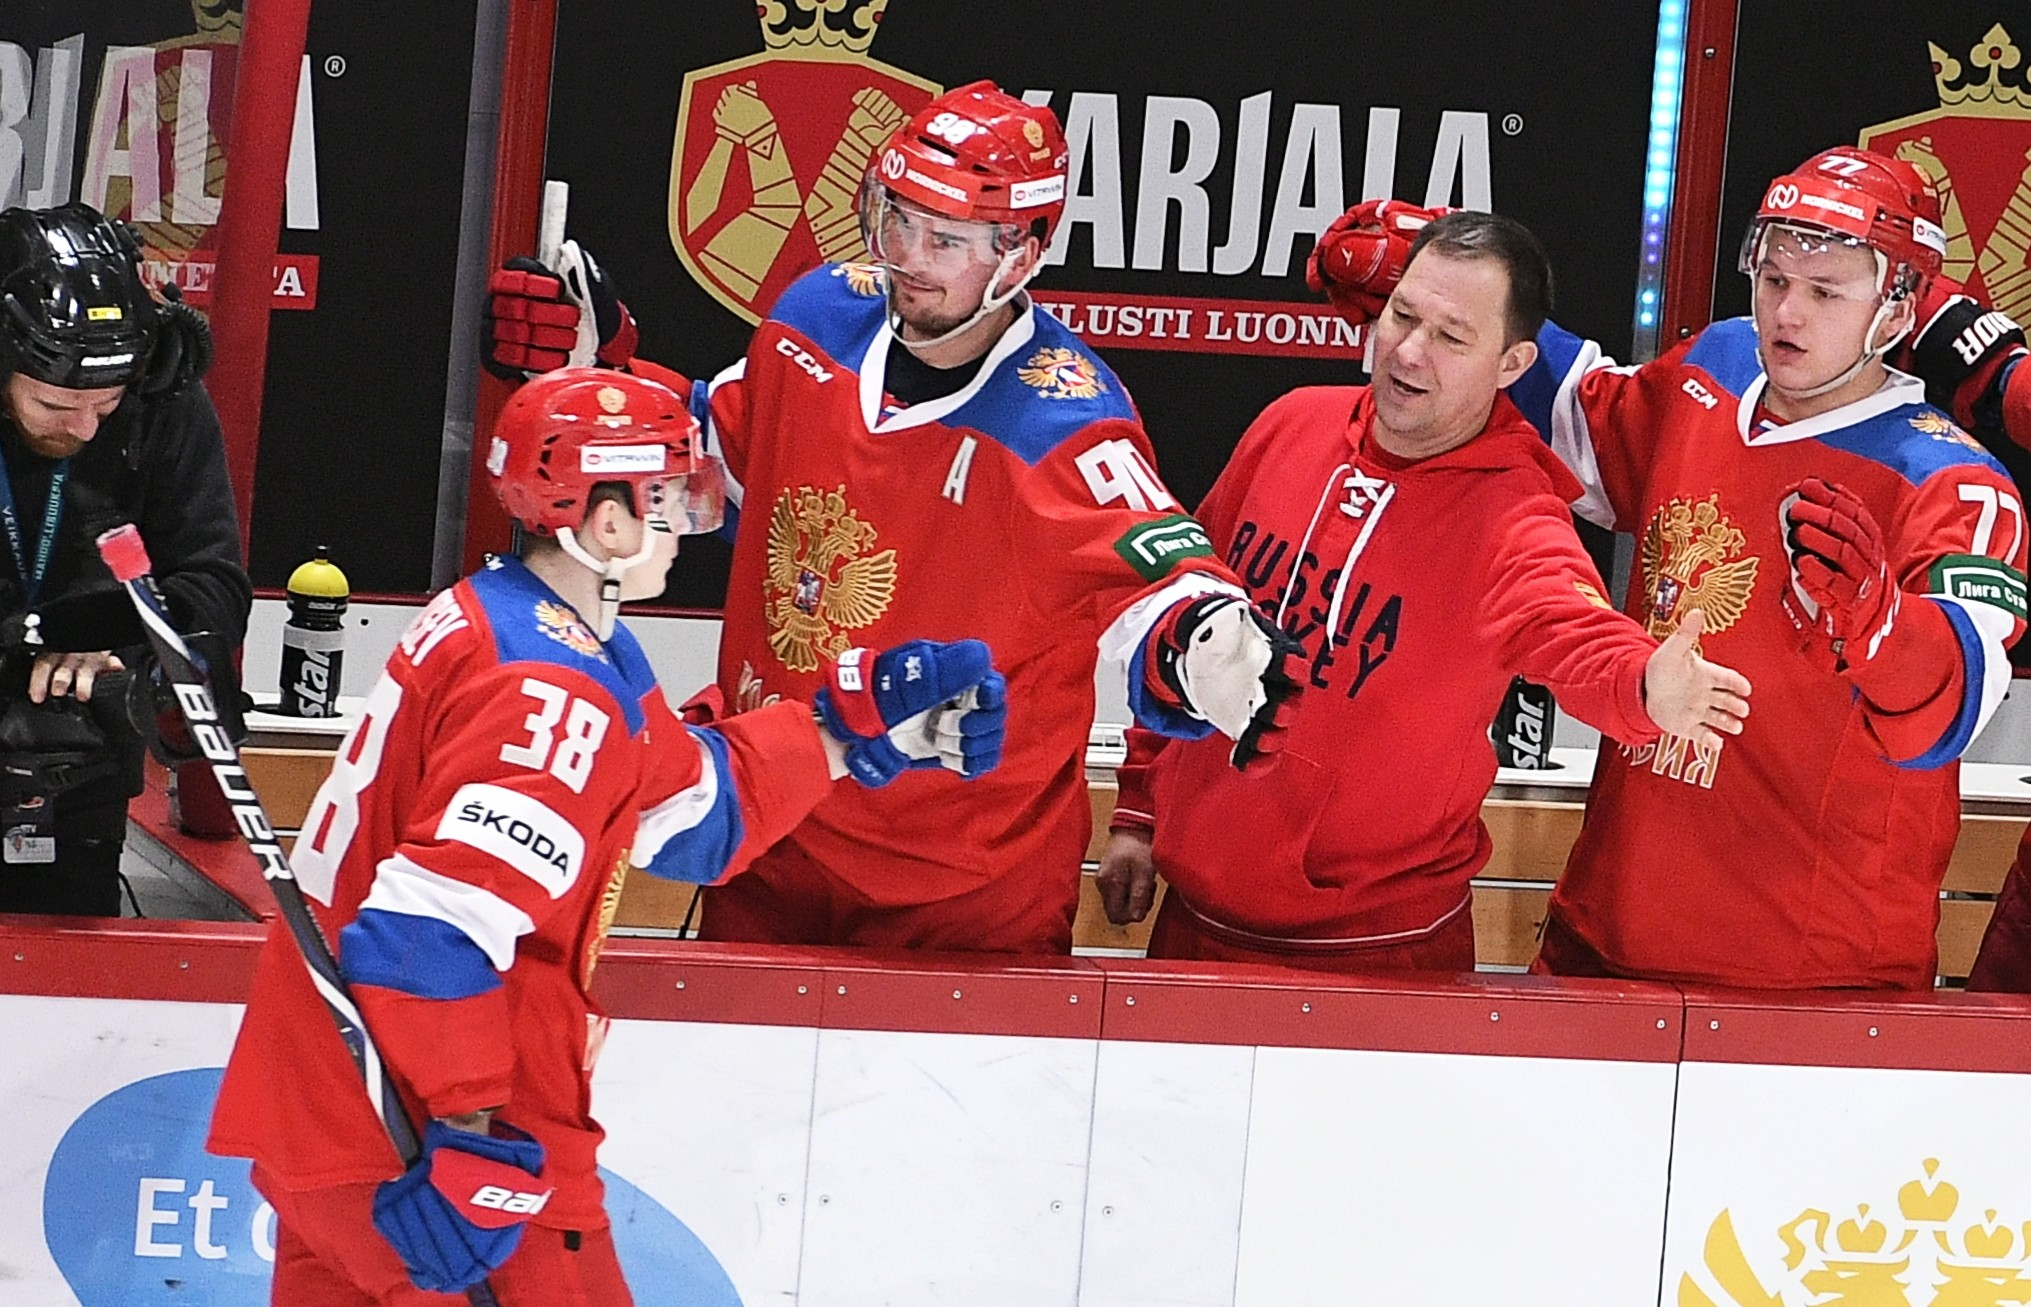 <p><span>Фото: &copy; РИА Новости/Алексей Даничев</span></p>